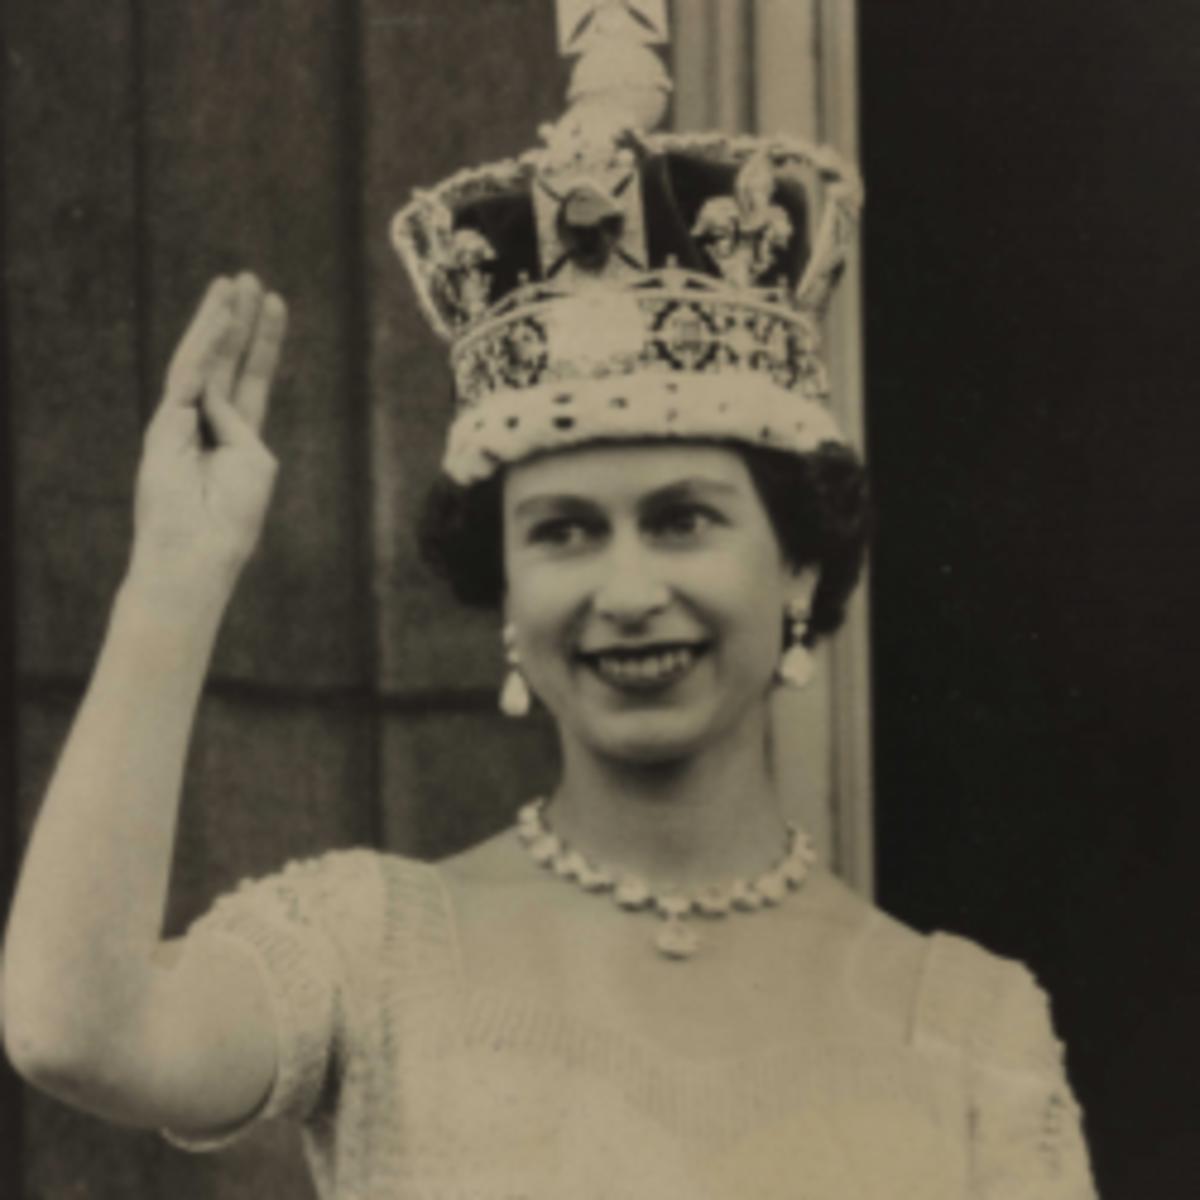 queen-elizabeth-second-accent-changes-over-years